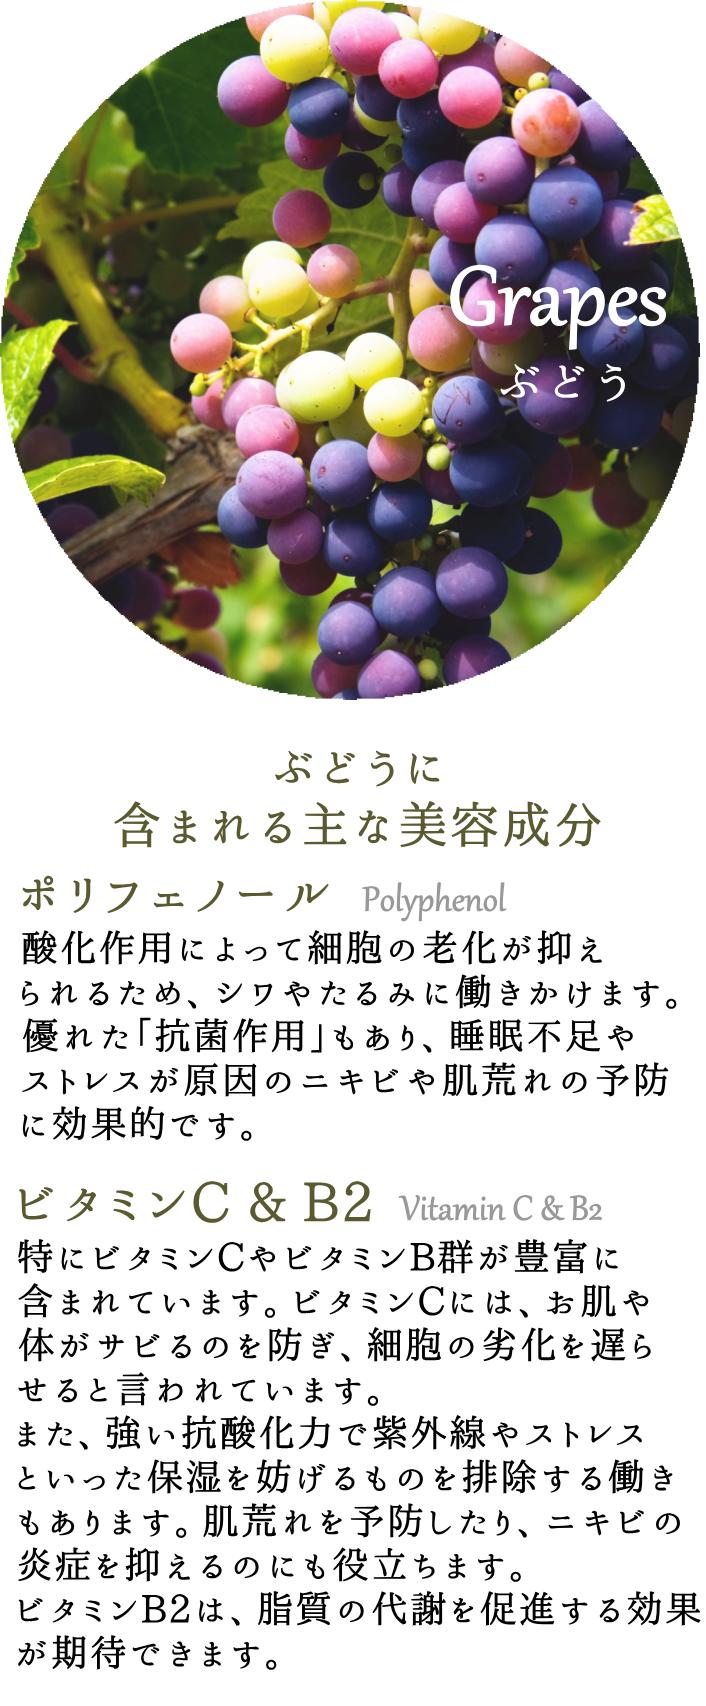 image-grapes5